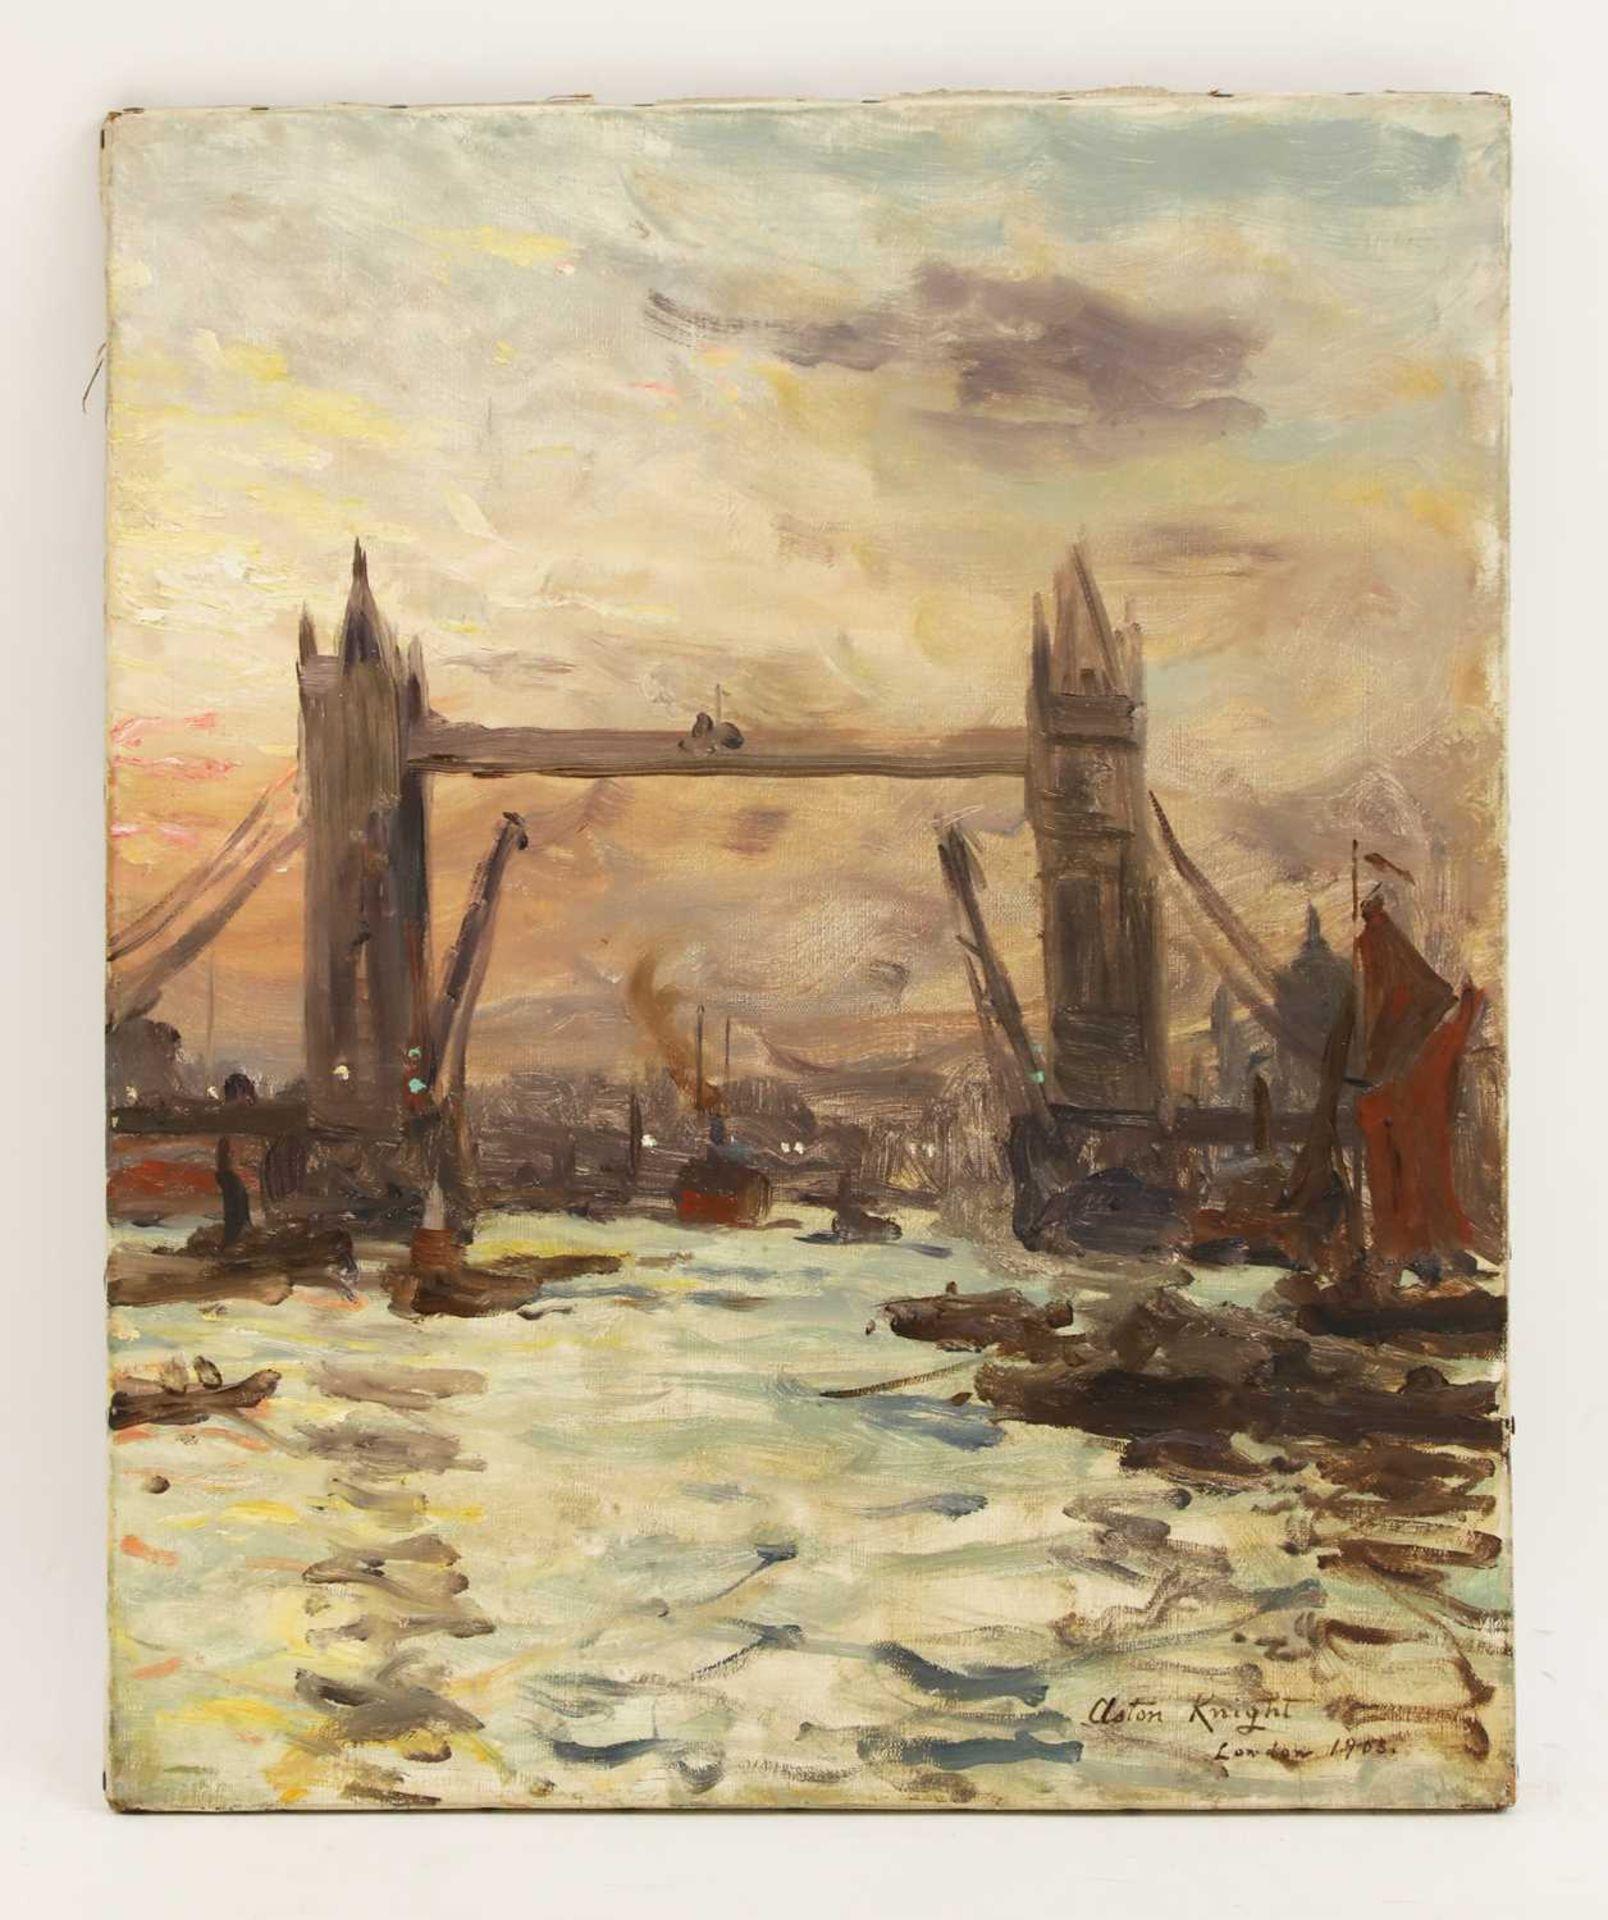 LOUIS ASTON KNIGHT (1873-1948) - Image 2 of 4